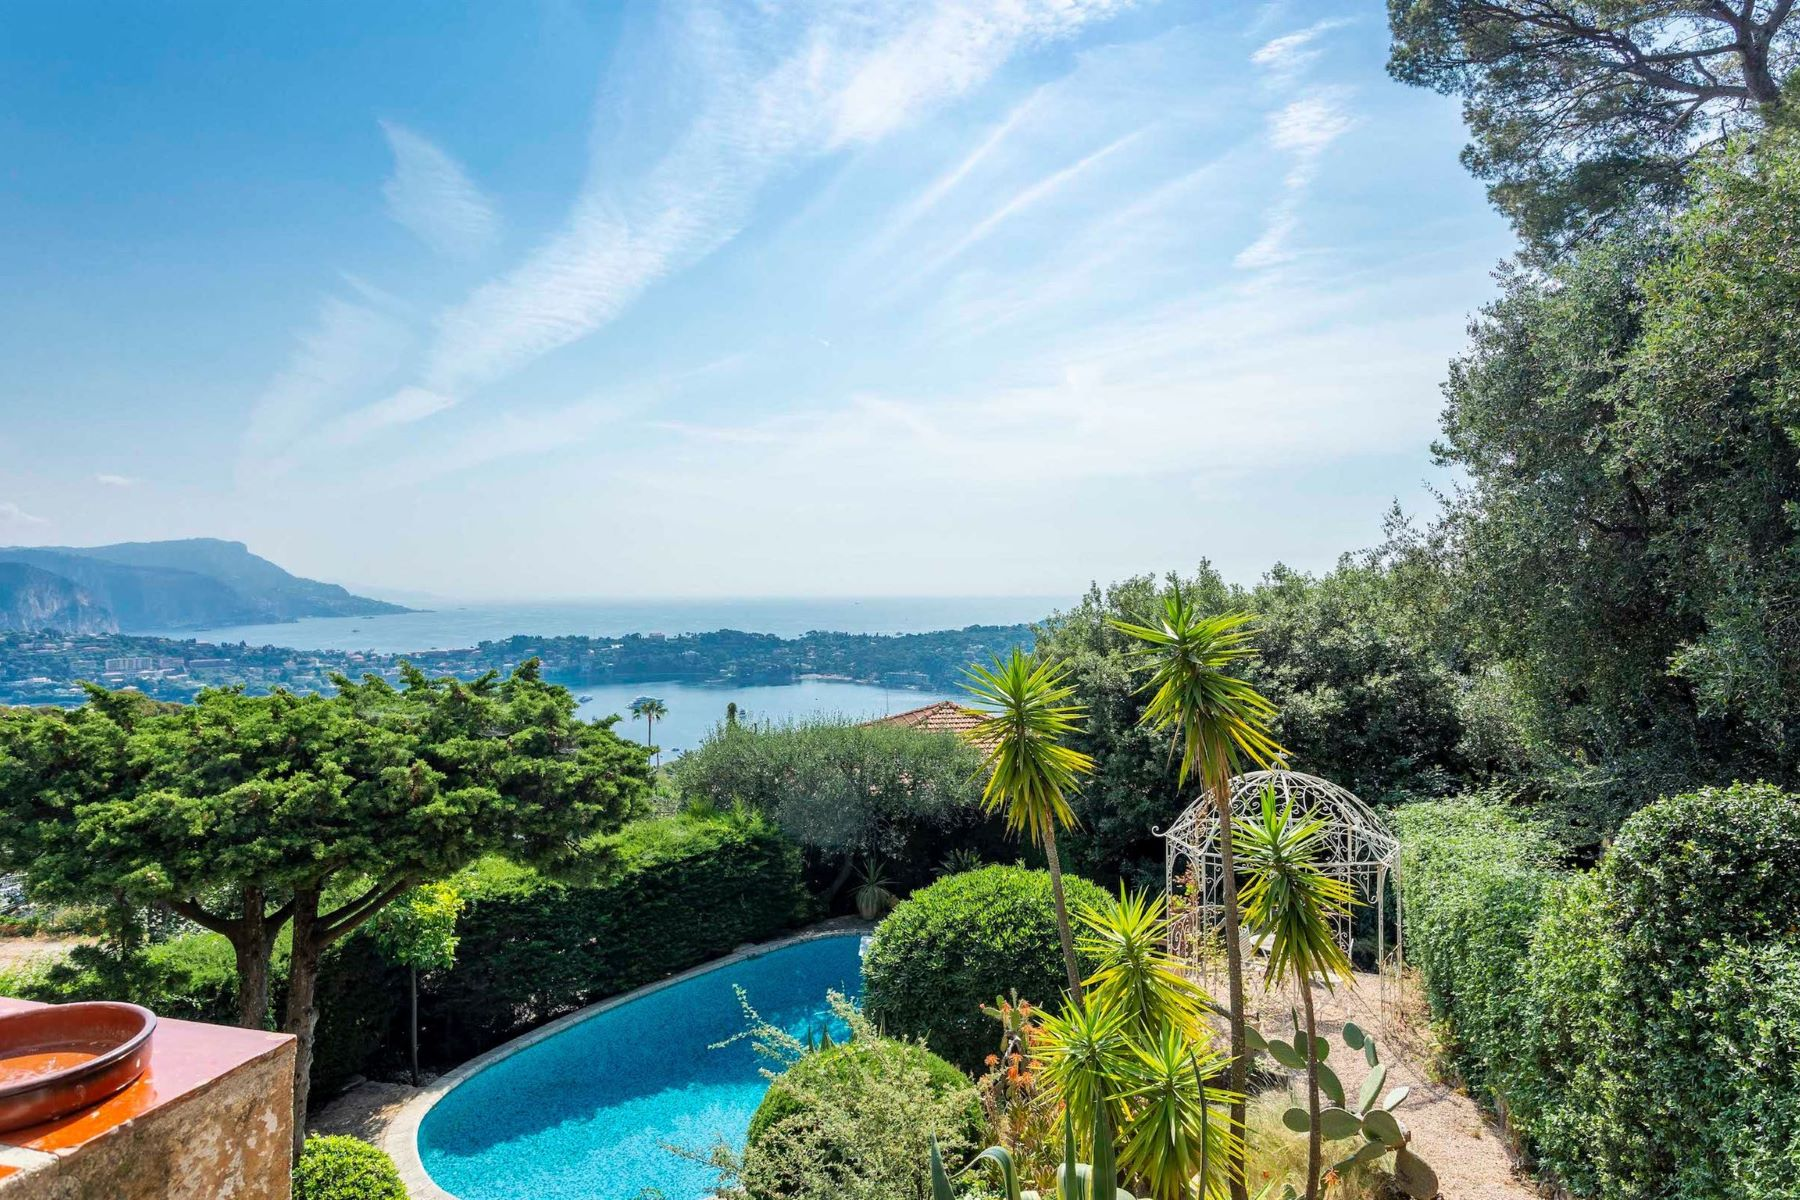 Single Family Homes por un Venta en Charming Villa overlooking the Bay of Villefranche-sur-Mer Villefranche Sur Mer, Provincia - Alpes - Costa Azul 06230 Francia